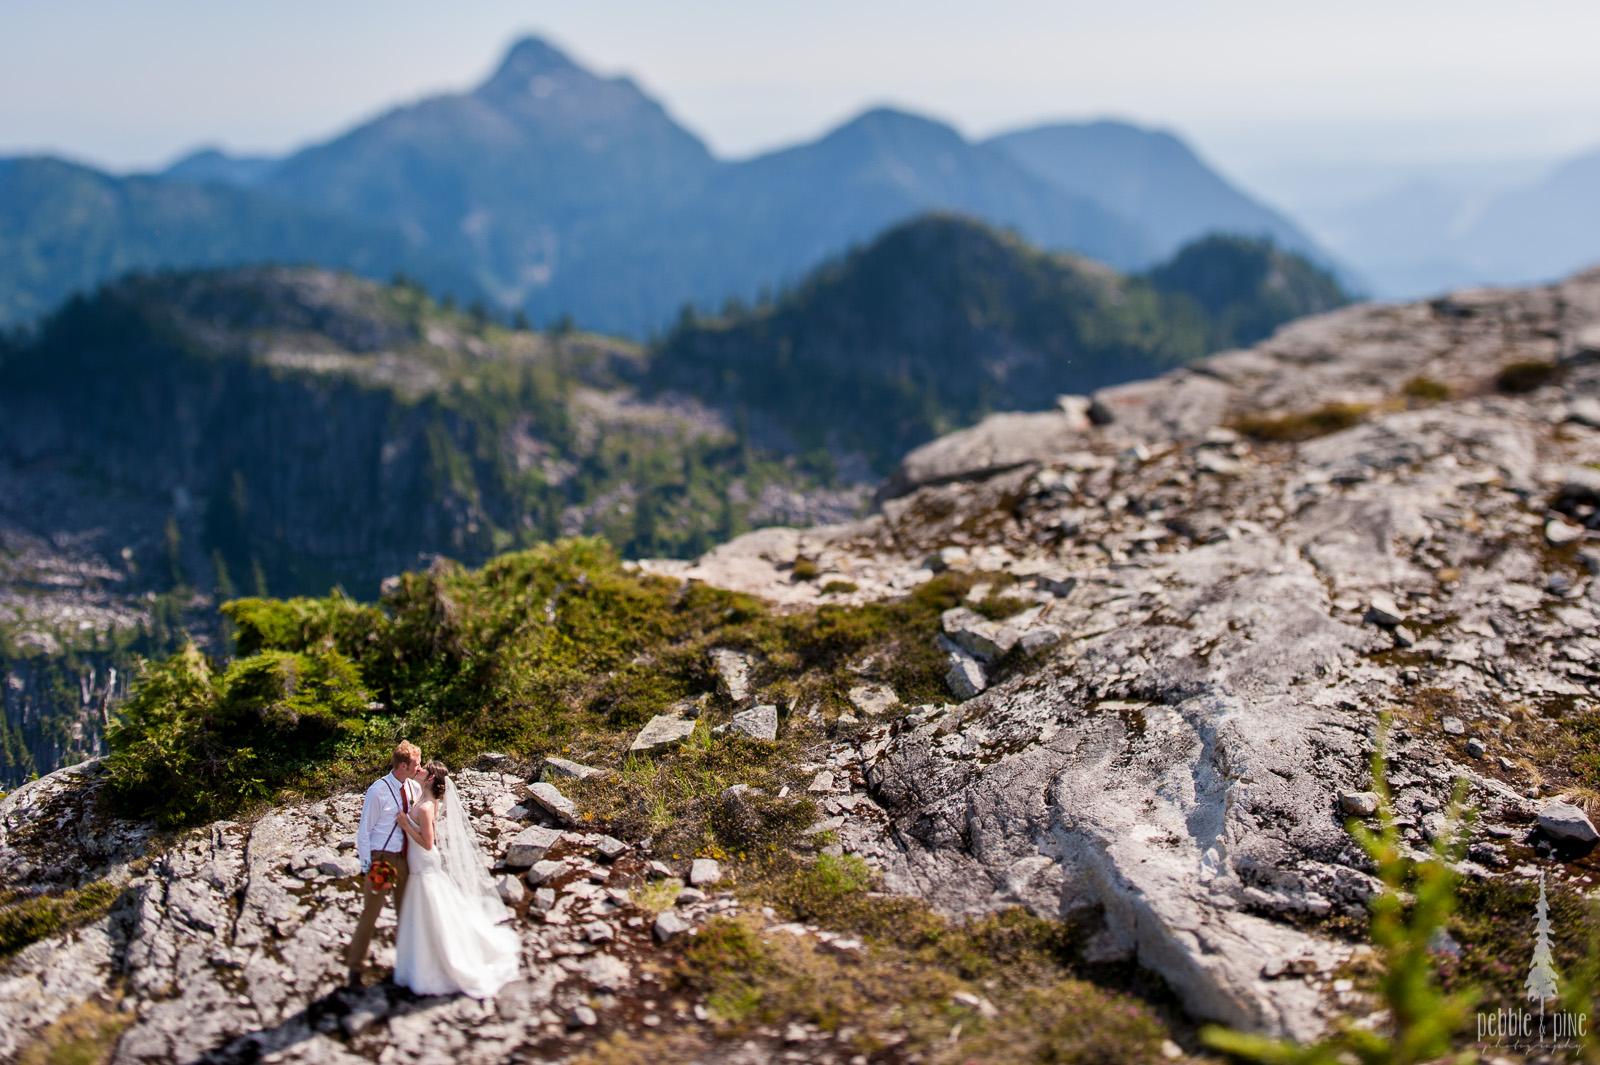 vancouver-island-wedding-photographers-golden-eagle-golf-course-wedding-mountaintop-wedding-43.jpg